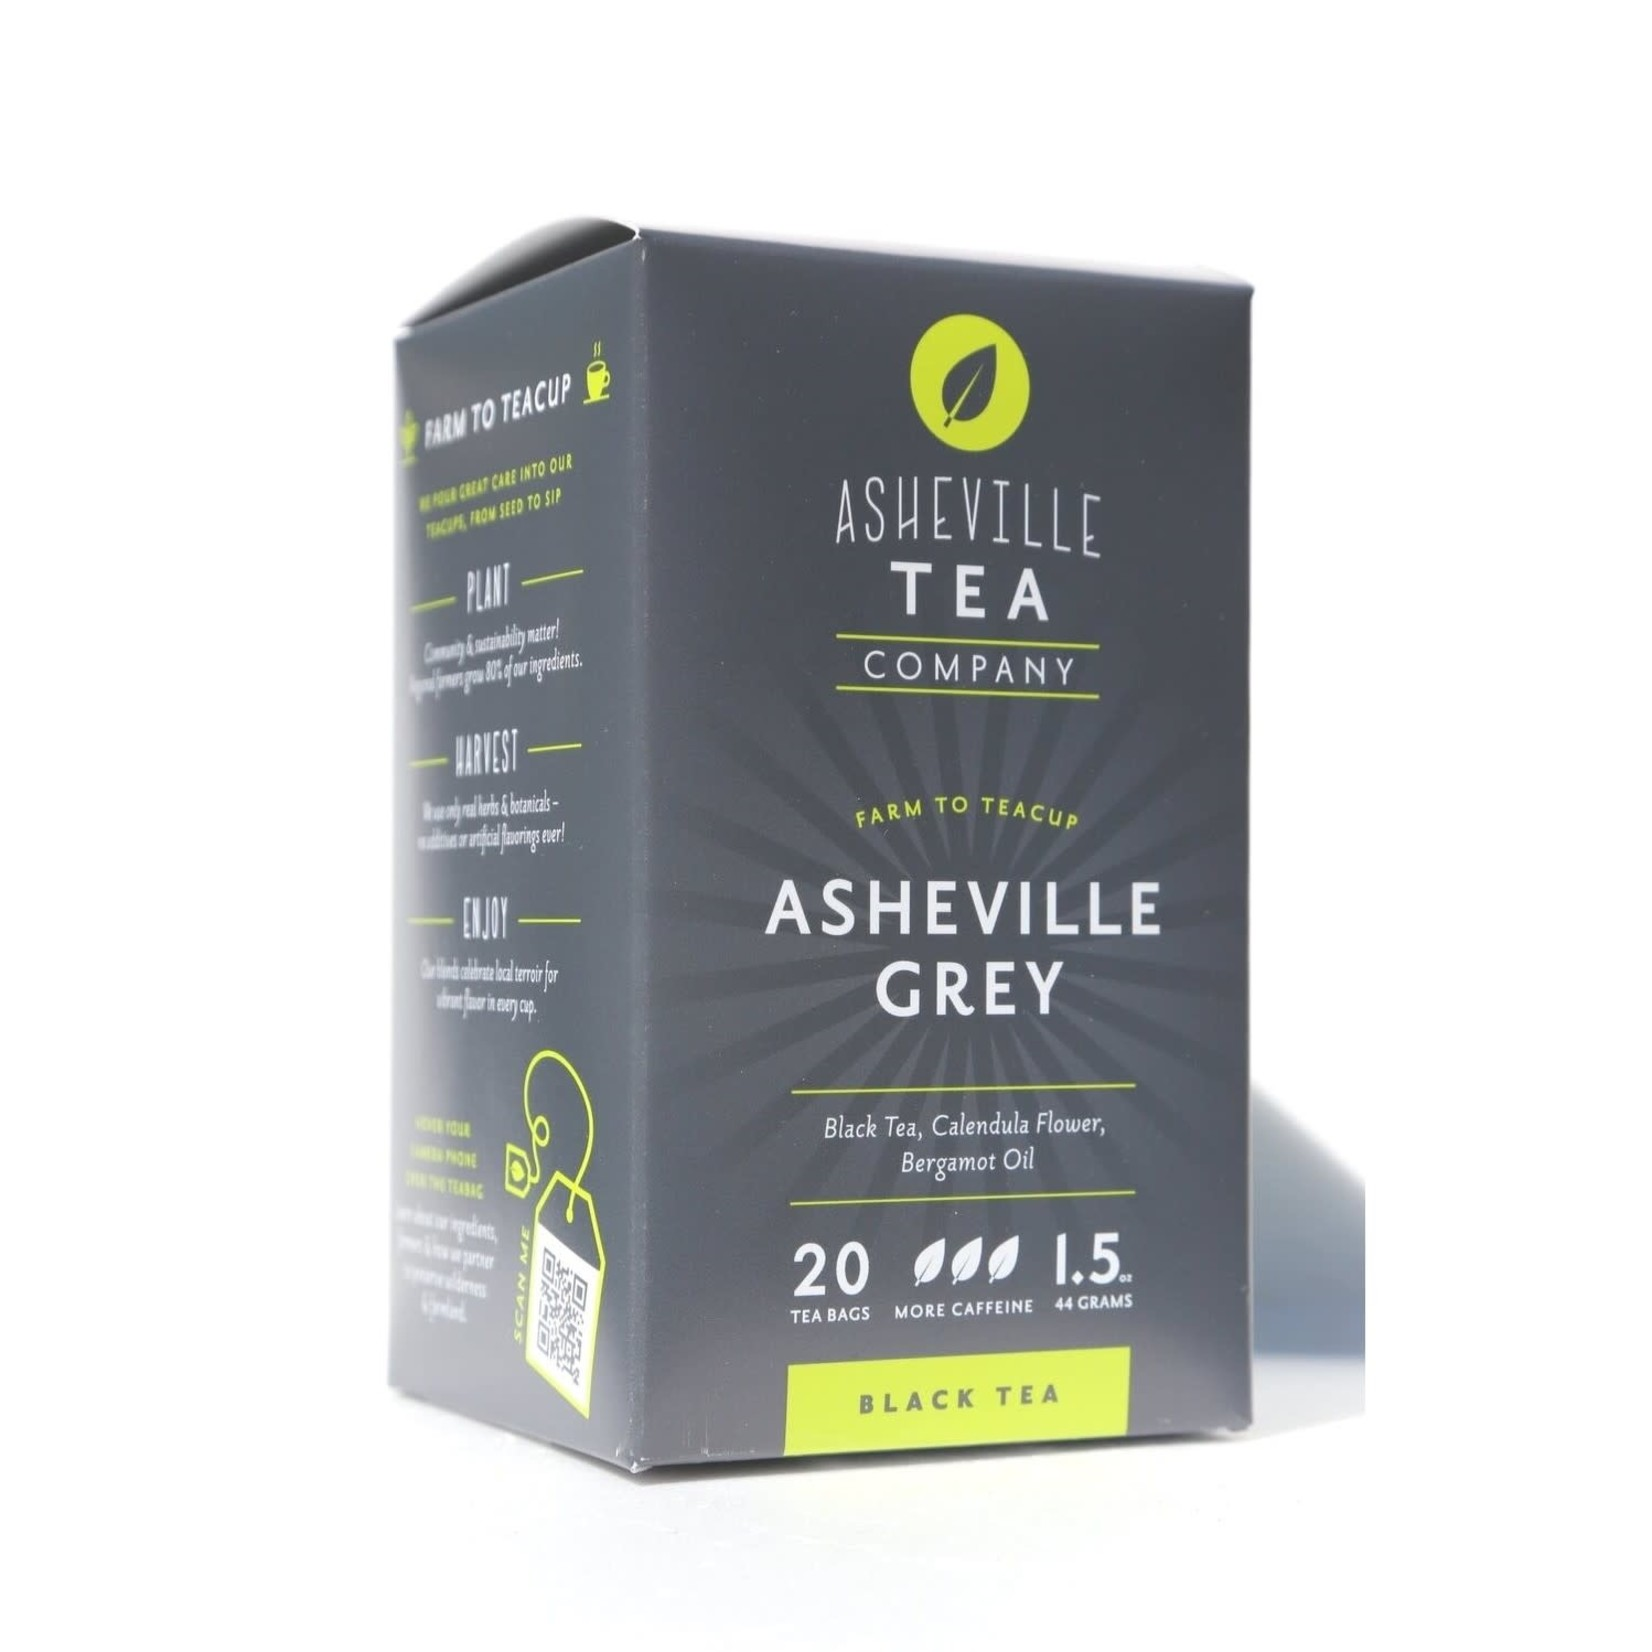 Asheville Tea Company Asheville Tea Box (20 bags)